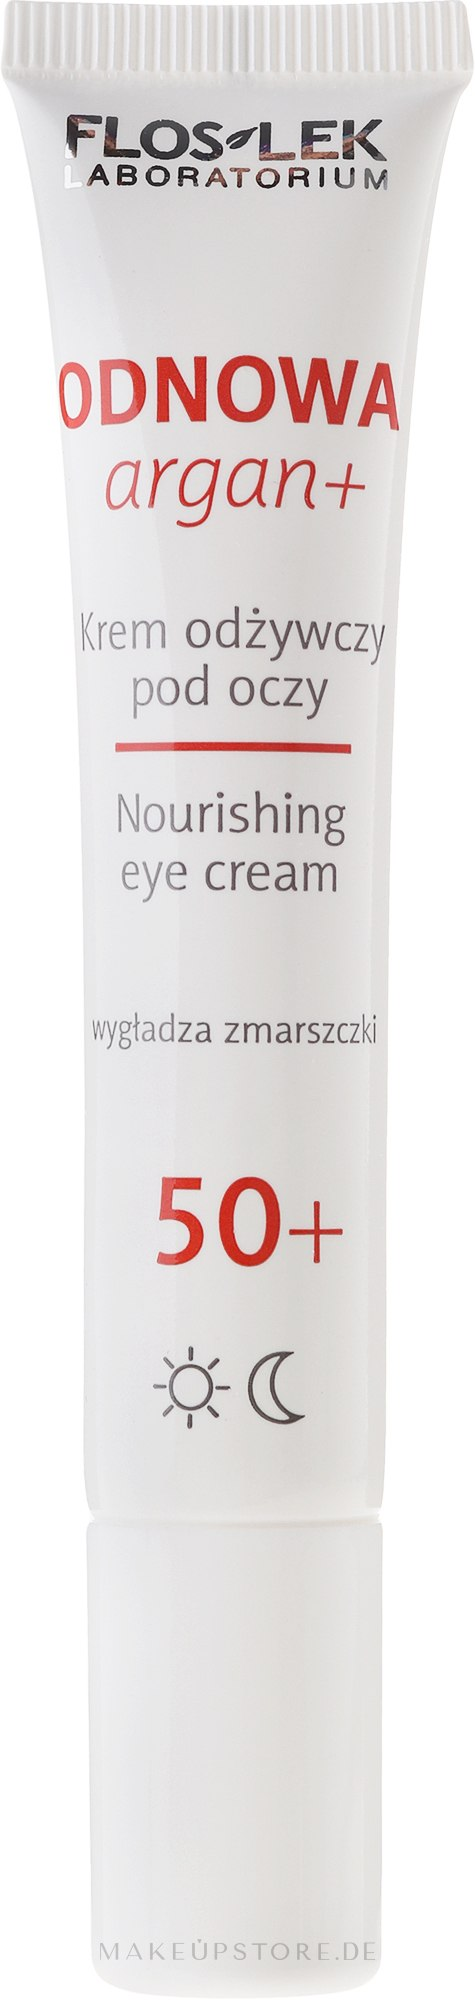 Augenkonturcreme - Floslek Nourishing eye cream 50+ — Bild 15 ml